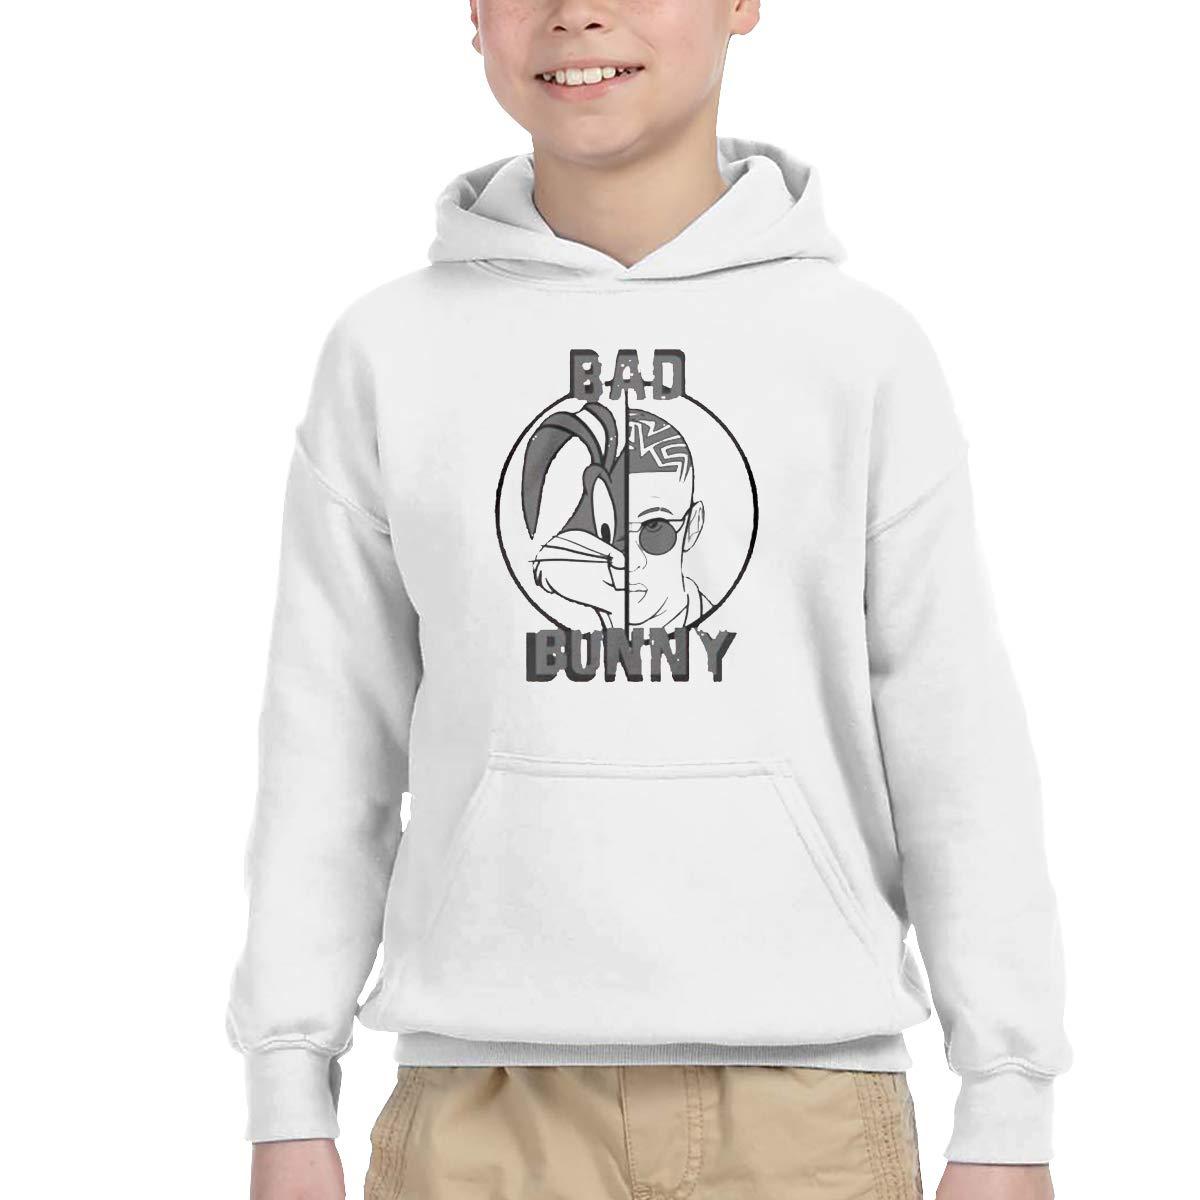 2-6 Year Old Childrens Hooded Pocket Sweater Bad /& Bunny Original Retro Literary Design White